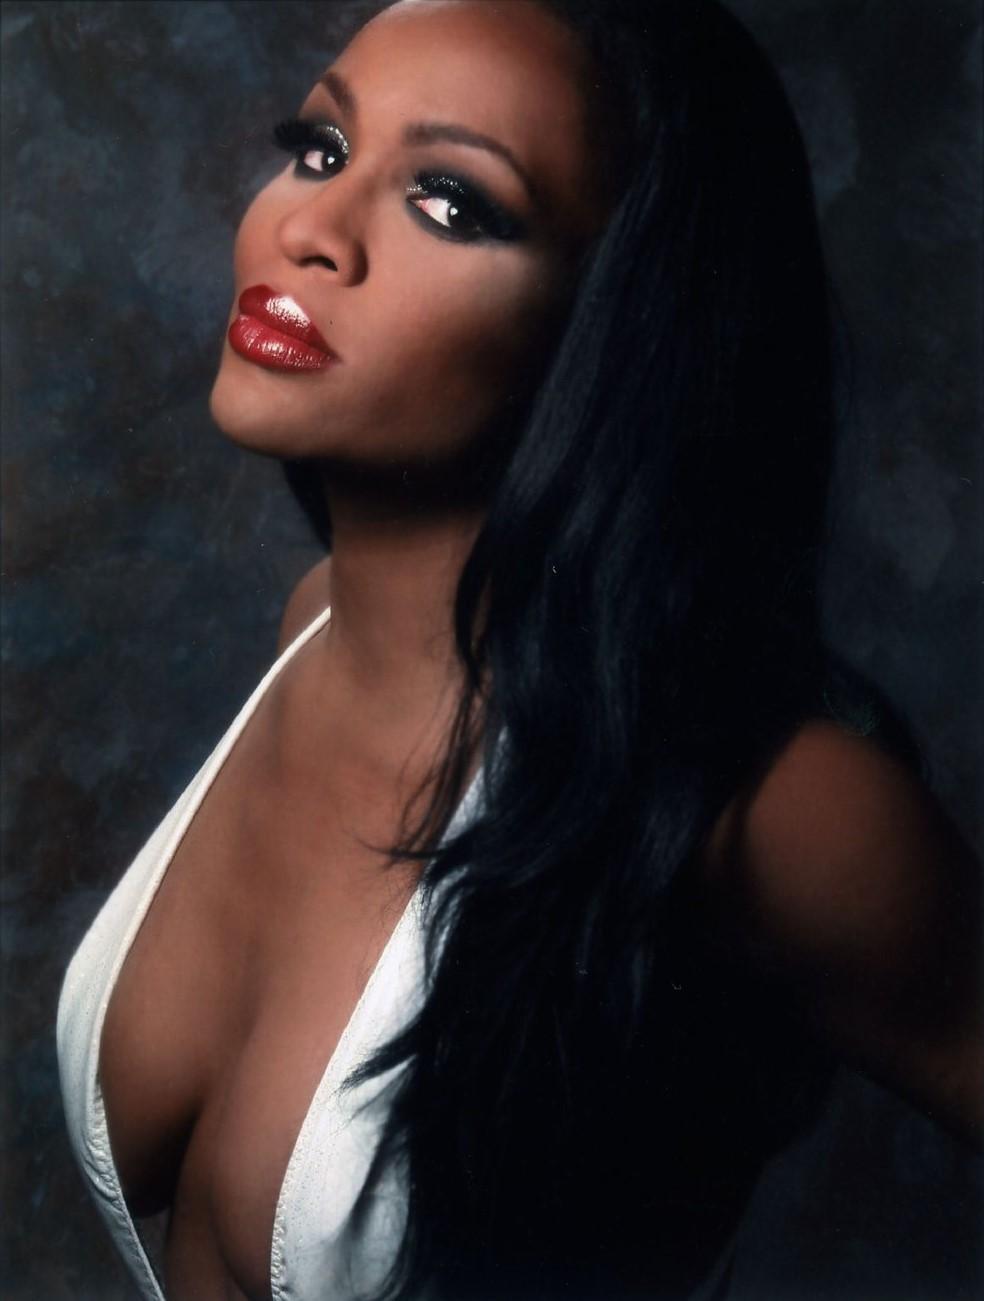 Tiara Russell